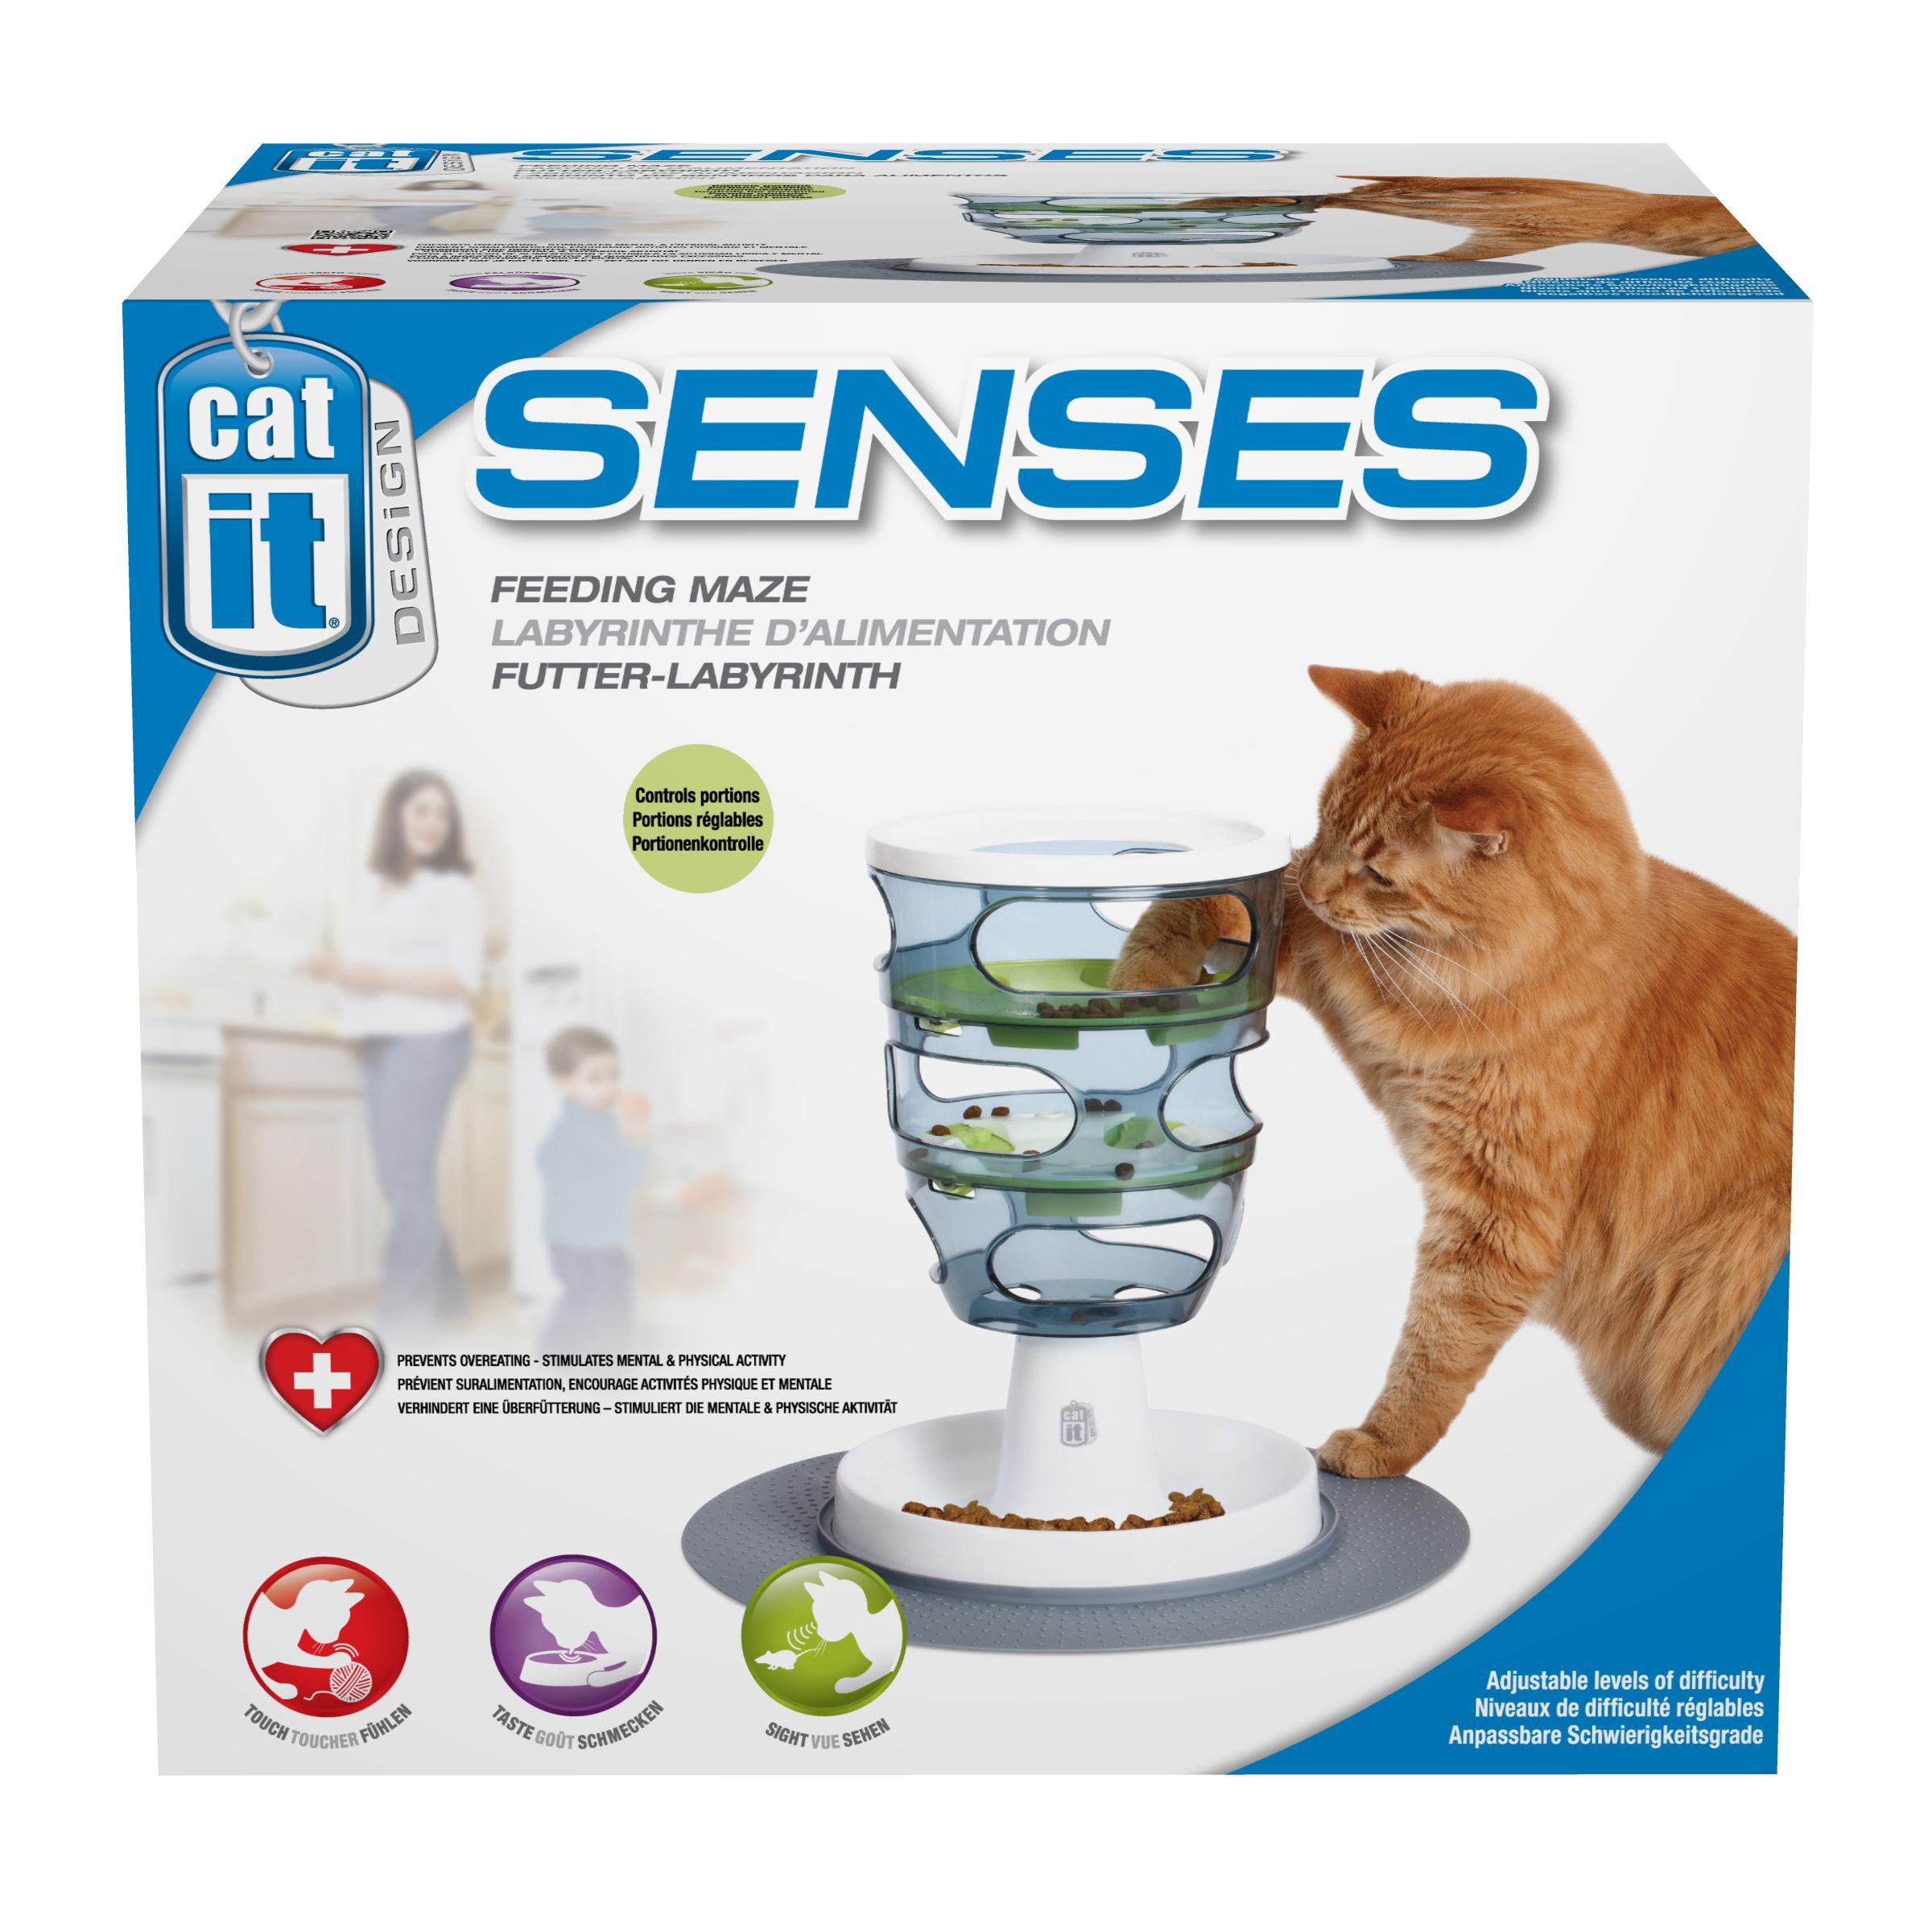 Catit Cat Senses Food Maze Cat Food Dispenser Peto